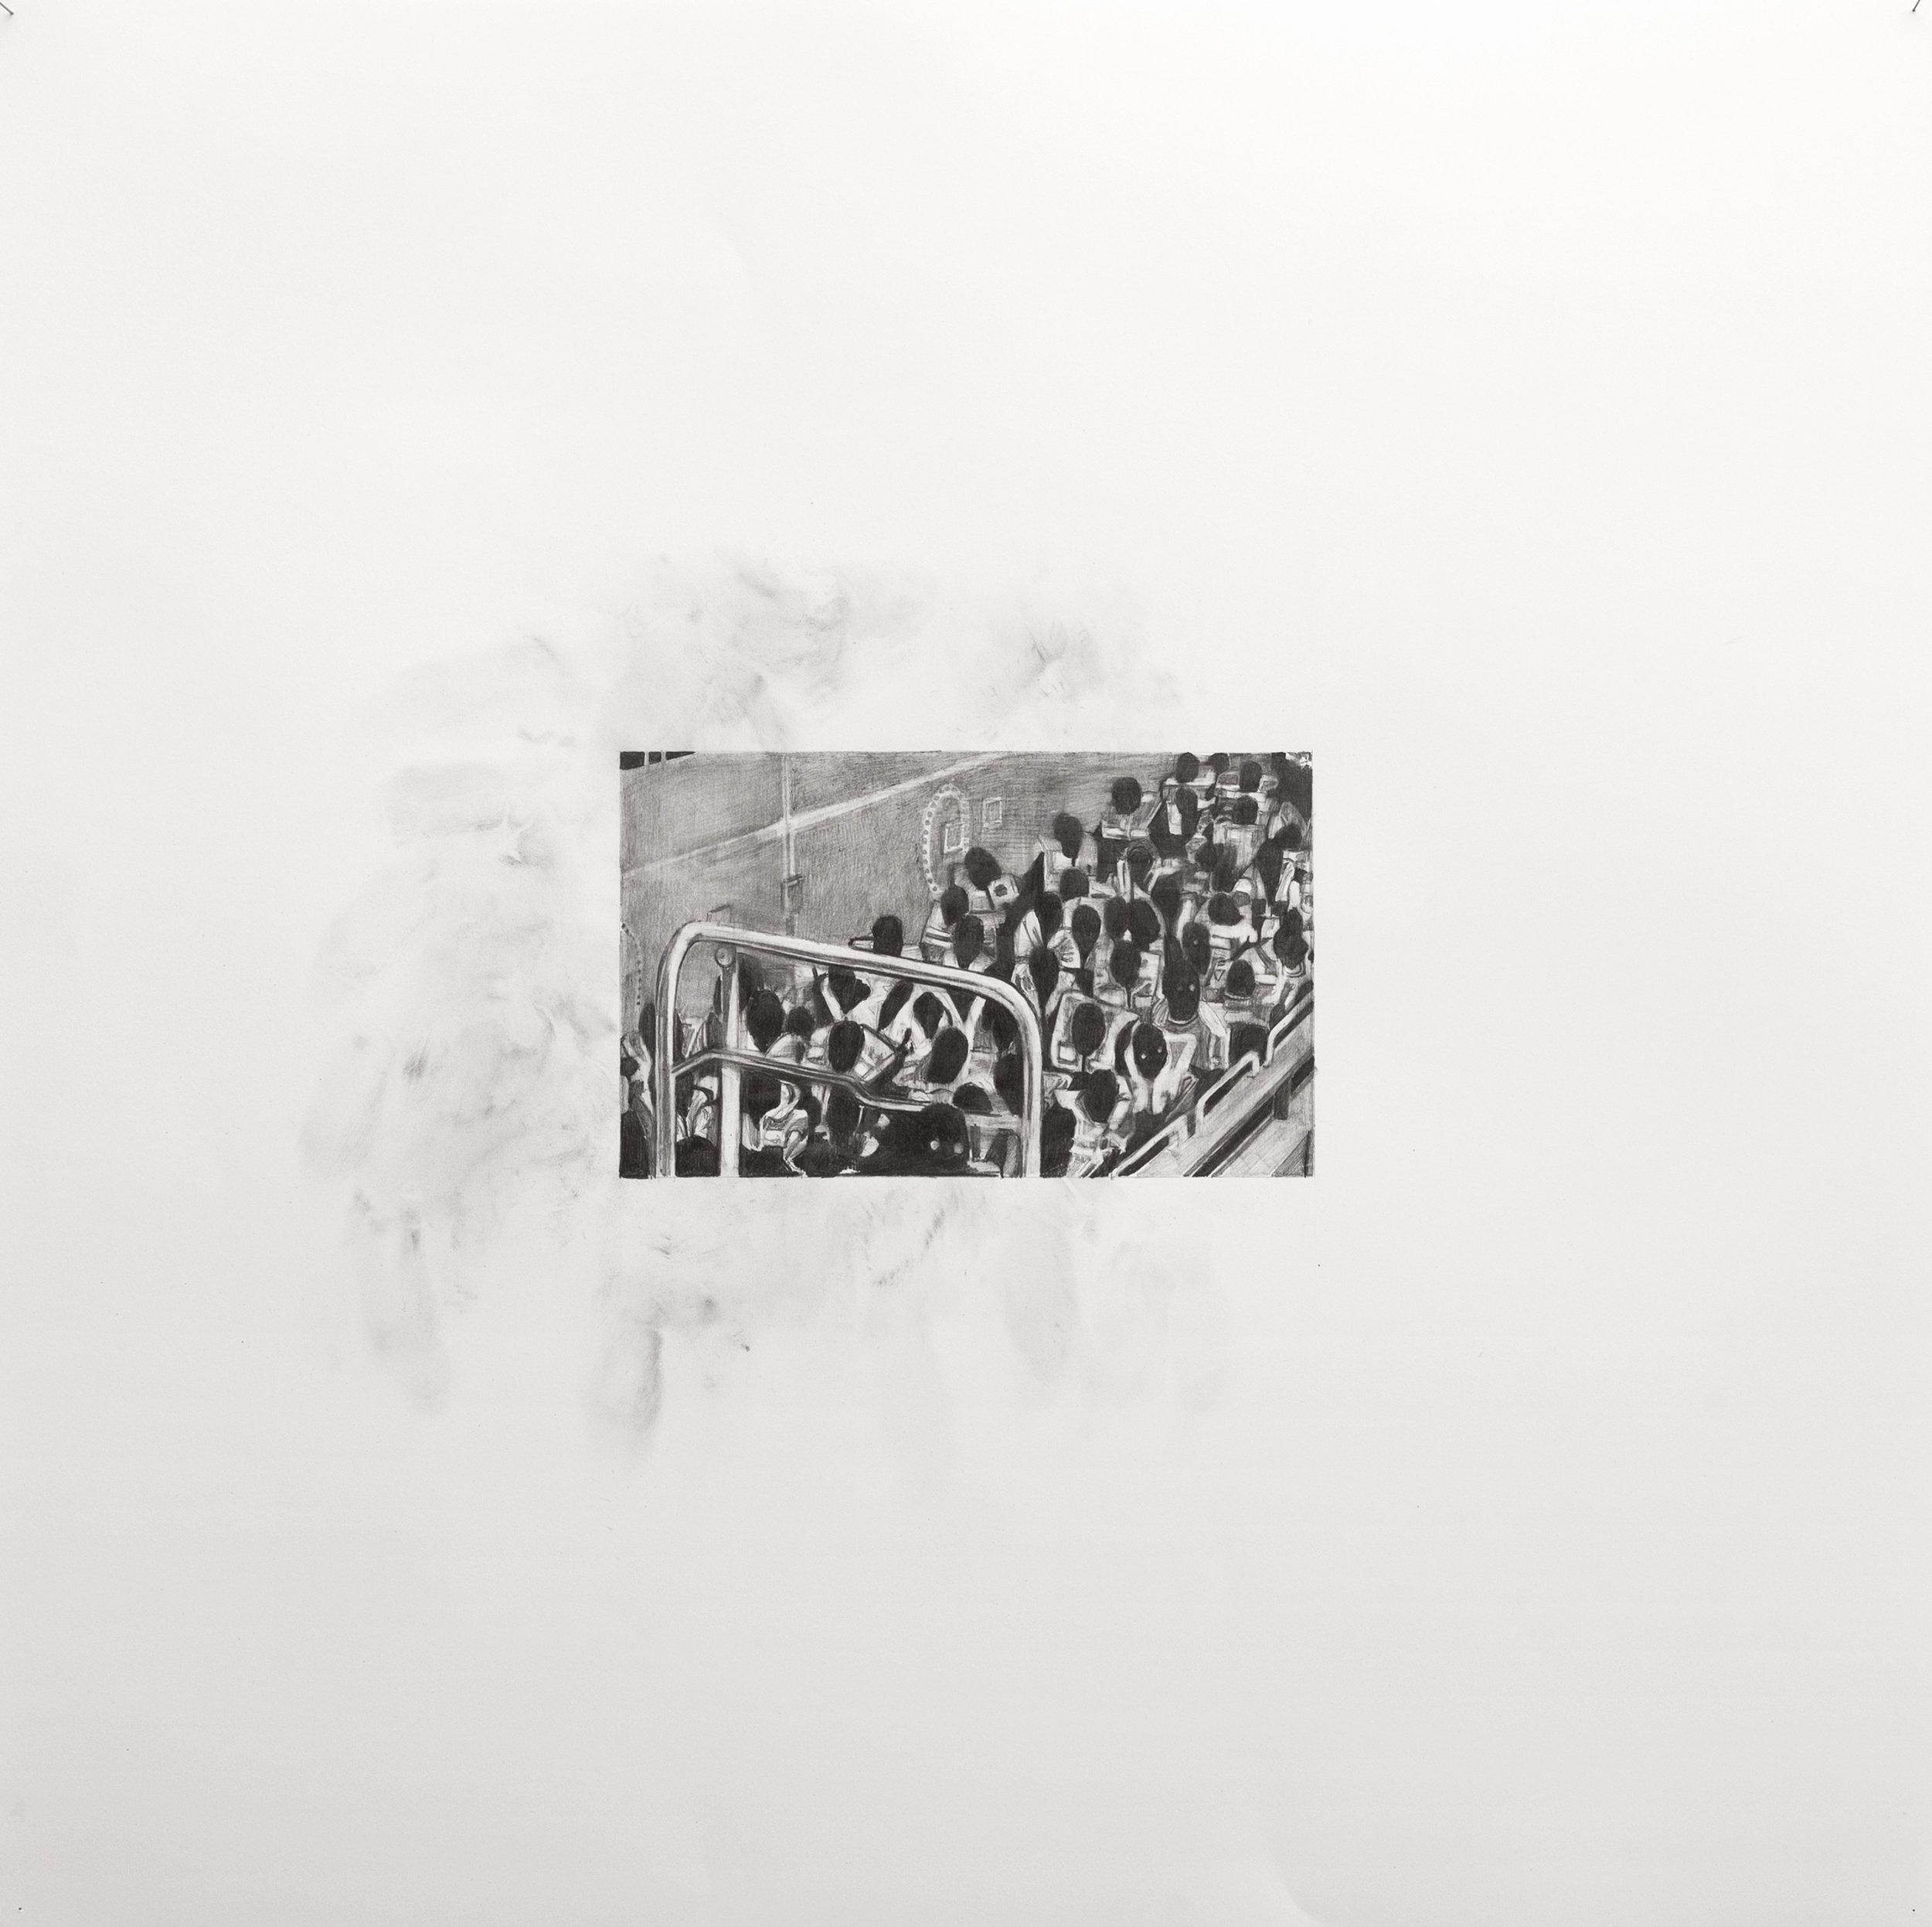 Marc Bauer –Untitled, Detail 3 Aquarius, 2018. Pencil on paper, 70 x 70 cm